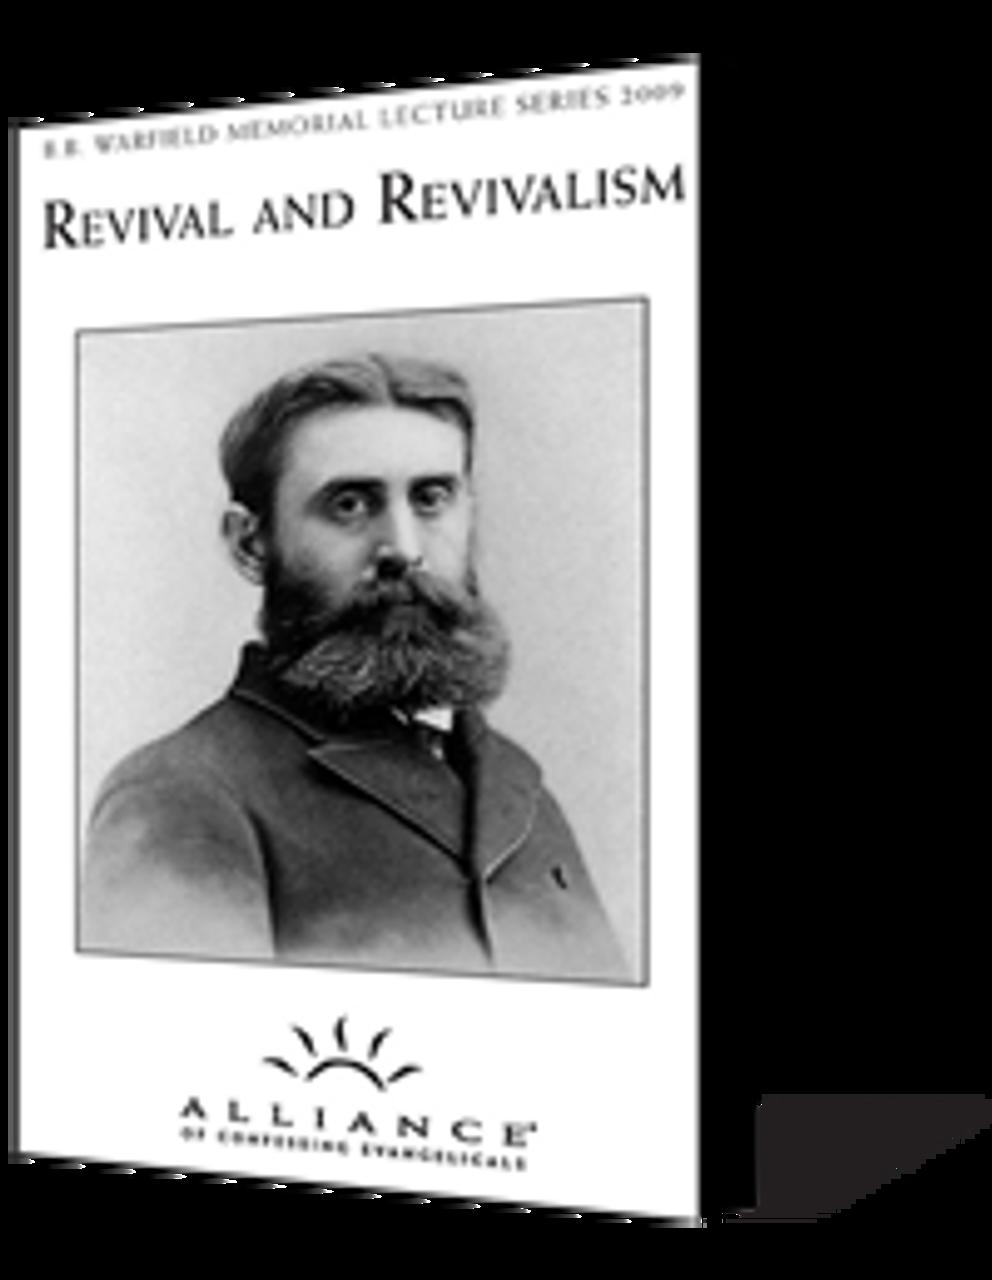 Revival and Revivalism (CD Set)